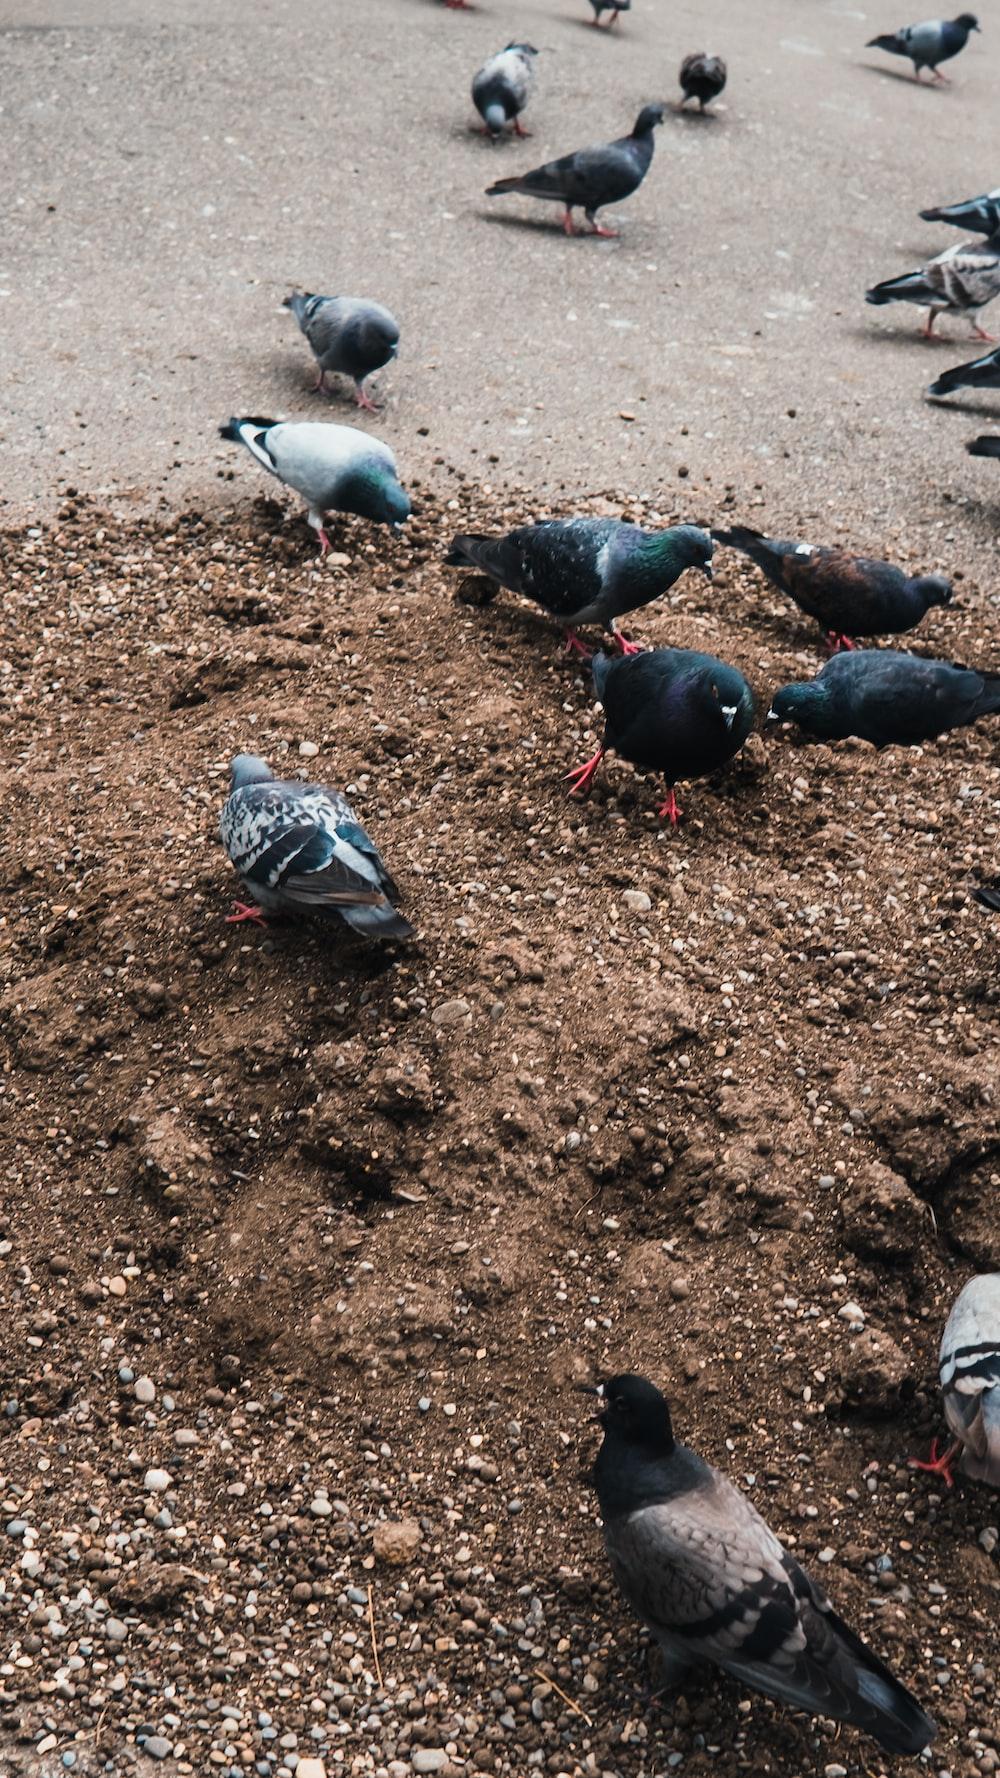 black and white birds on brown soil